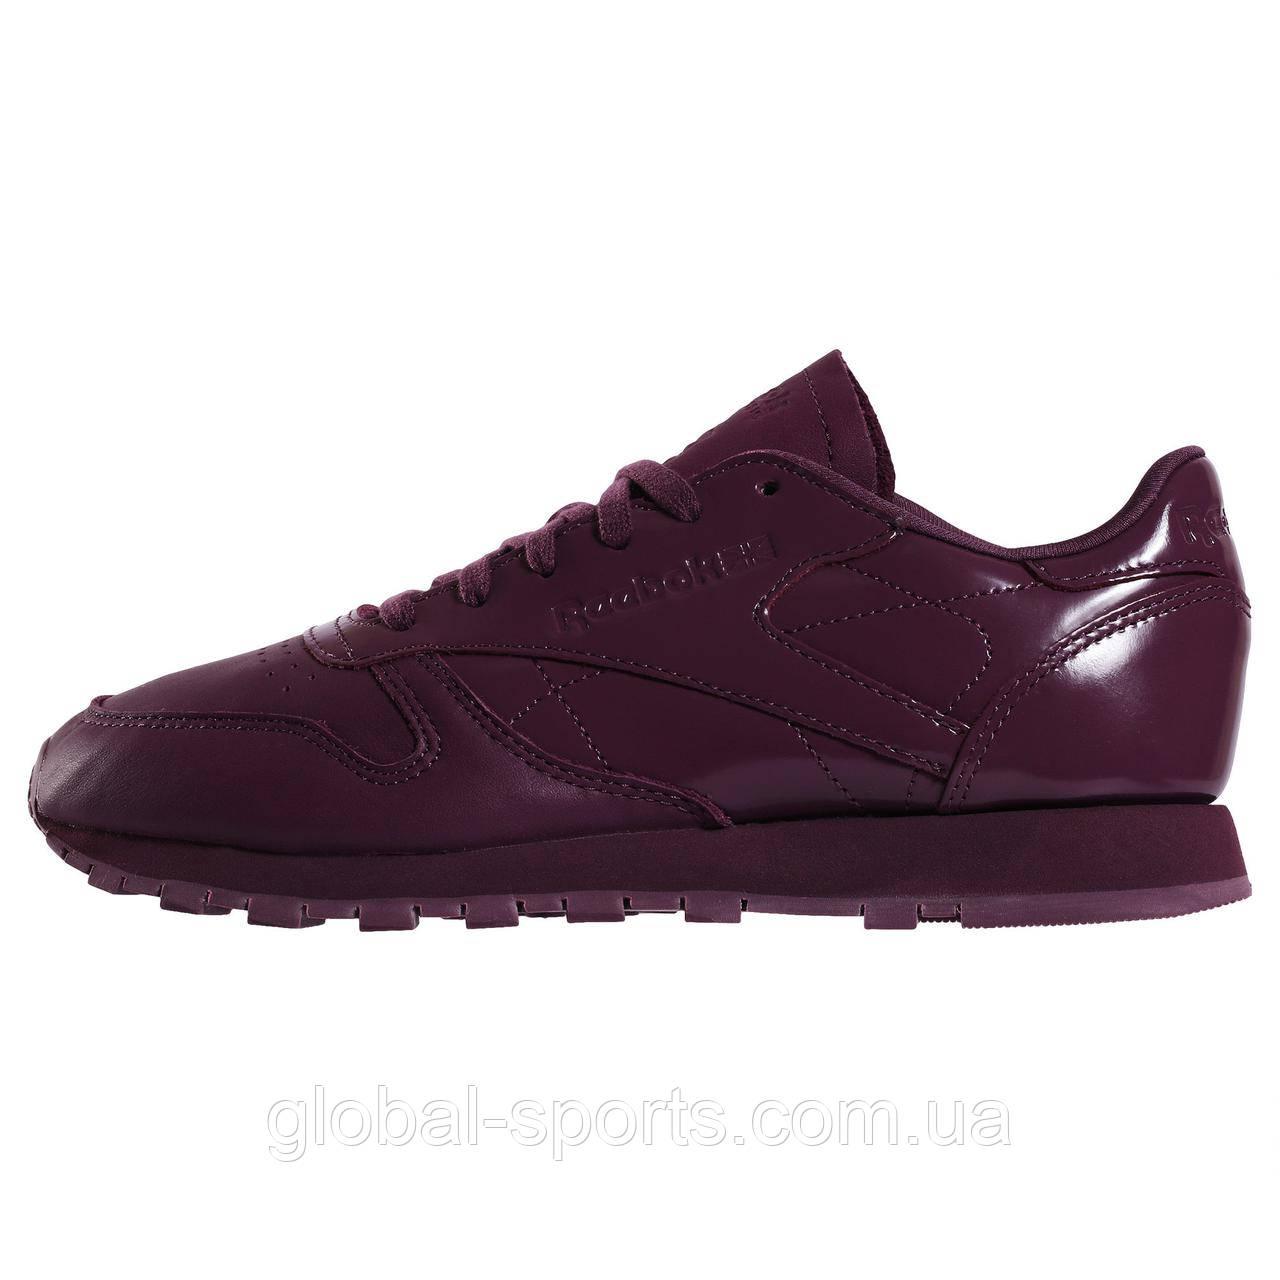 1f3319294f7d Женские кроссовки Reebok Classic Leather IL(Артикул CN1769)  продажа ...